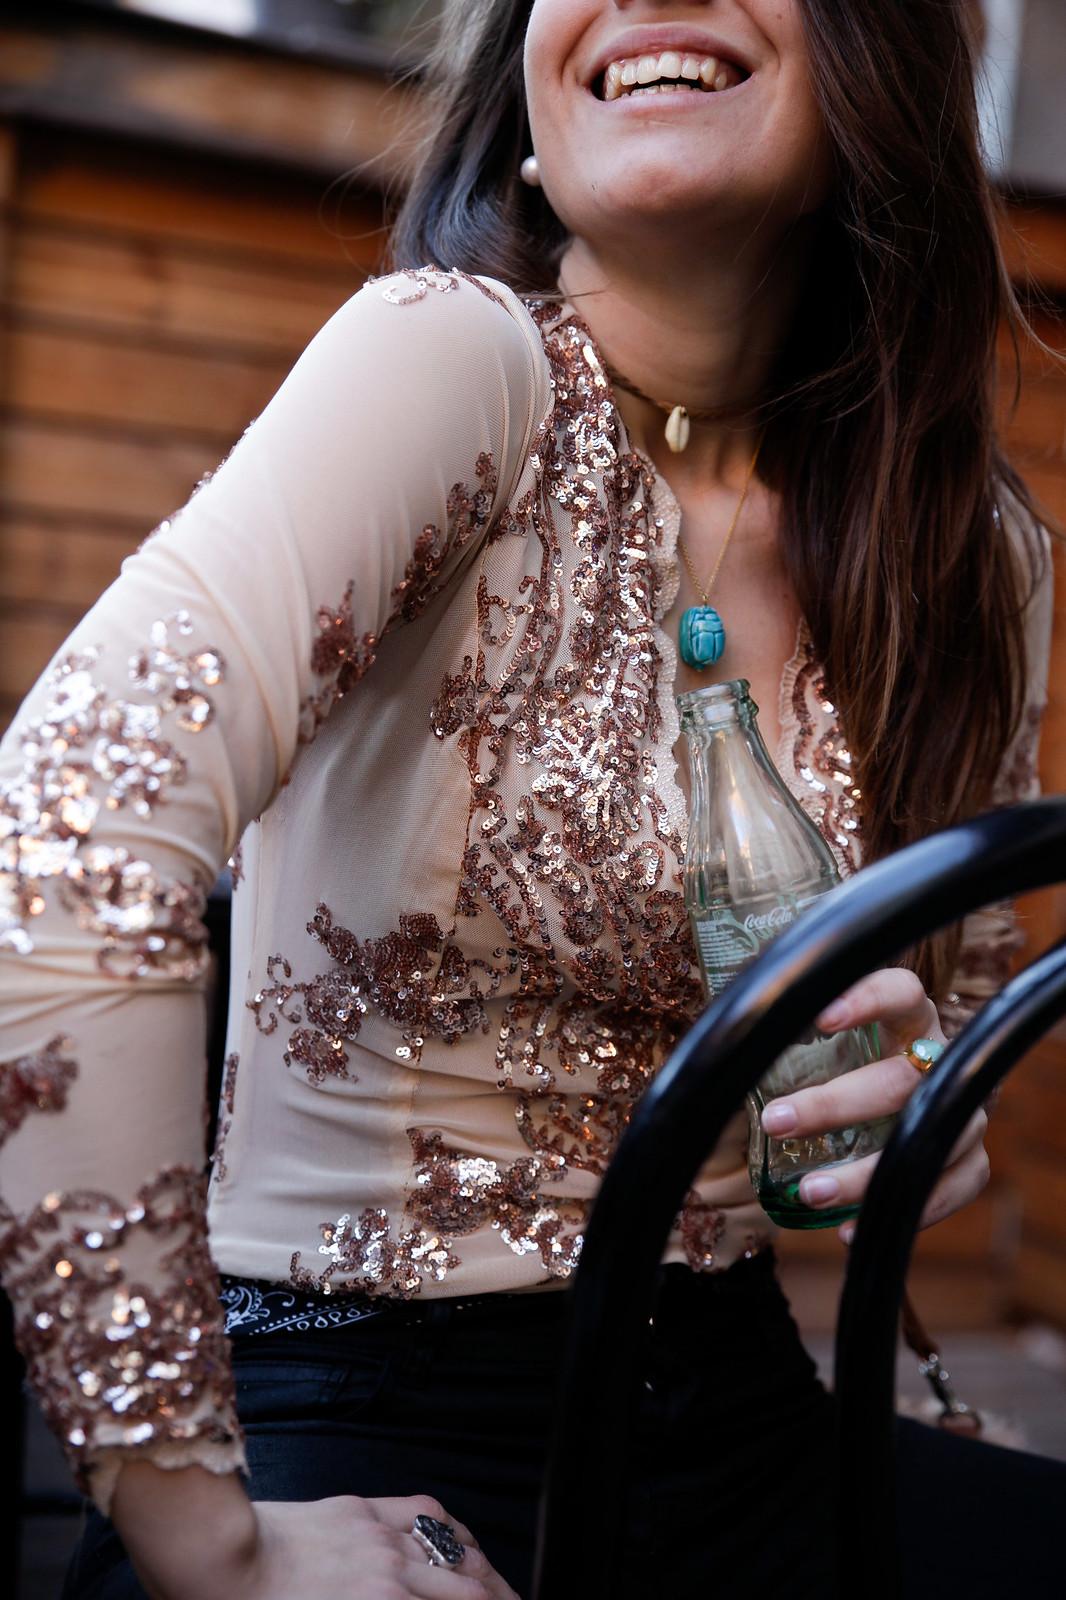 07_Sequins_Body_Nihgt_outfit_Danity_Paris_theguestgirl_laura_santolaria_coca_cola_girl